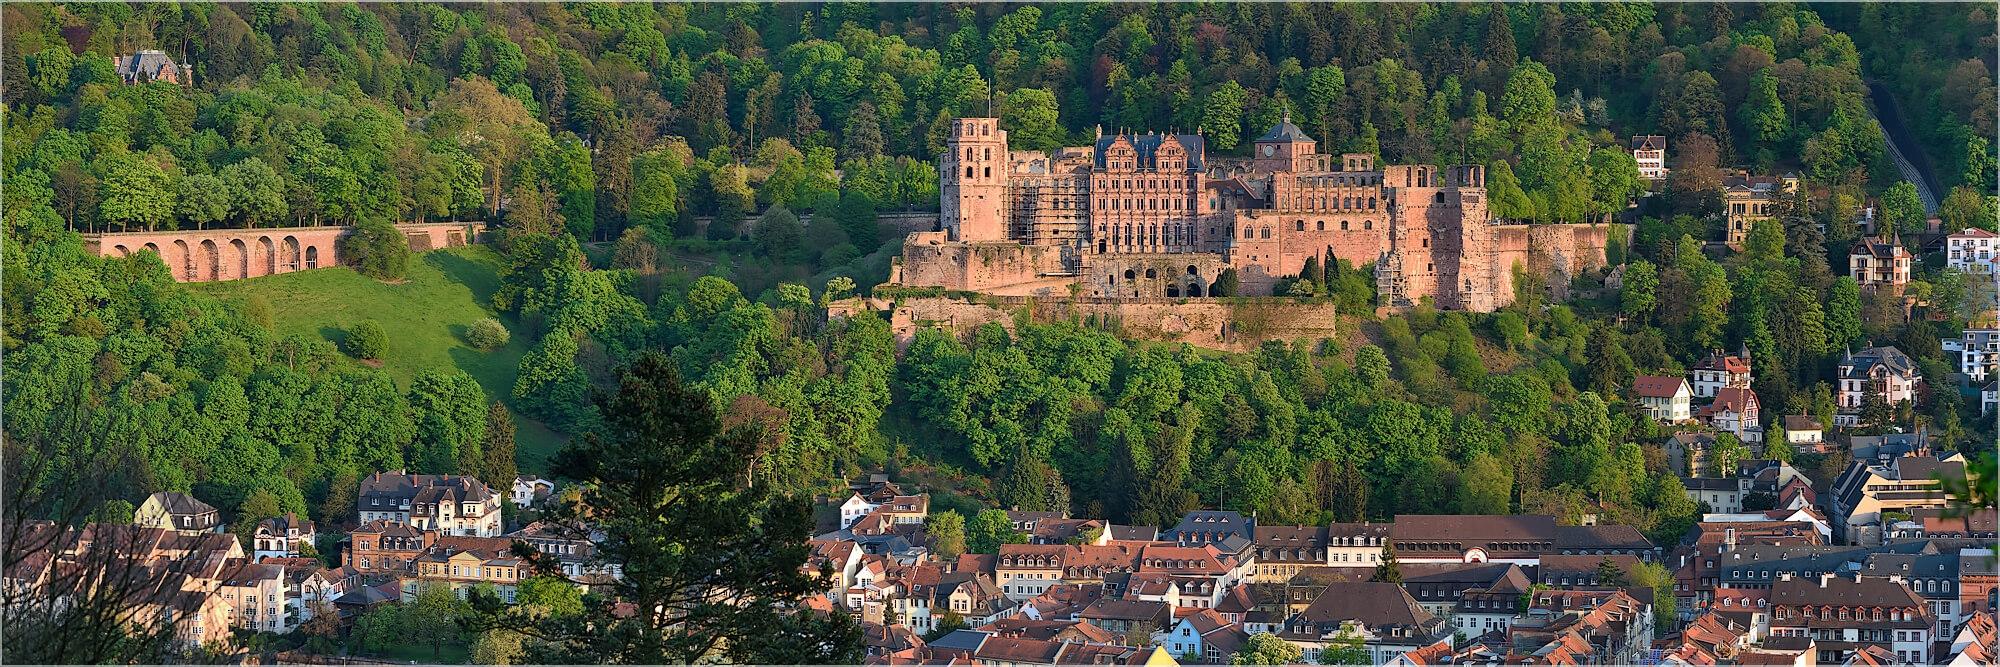 Panoramabild Heidelberger Schloß Heidelberg